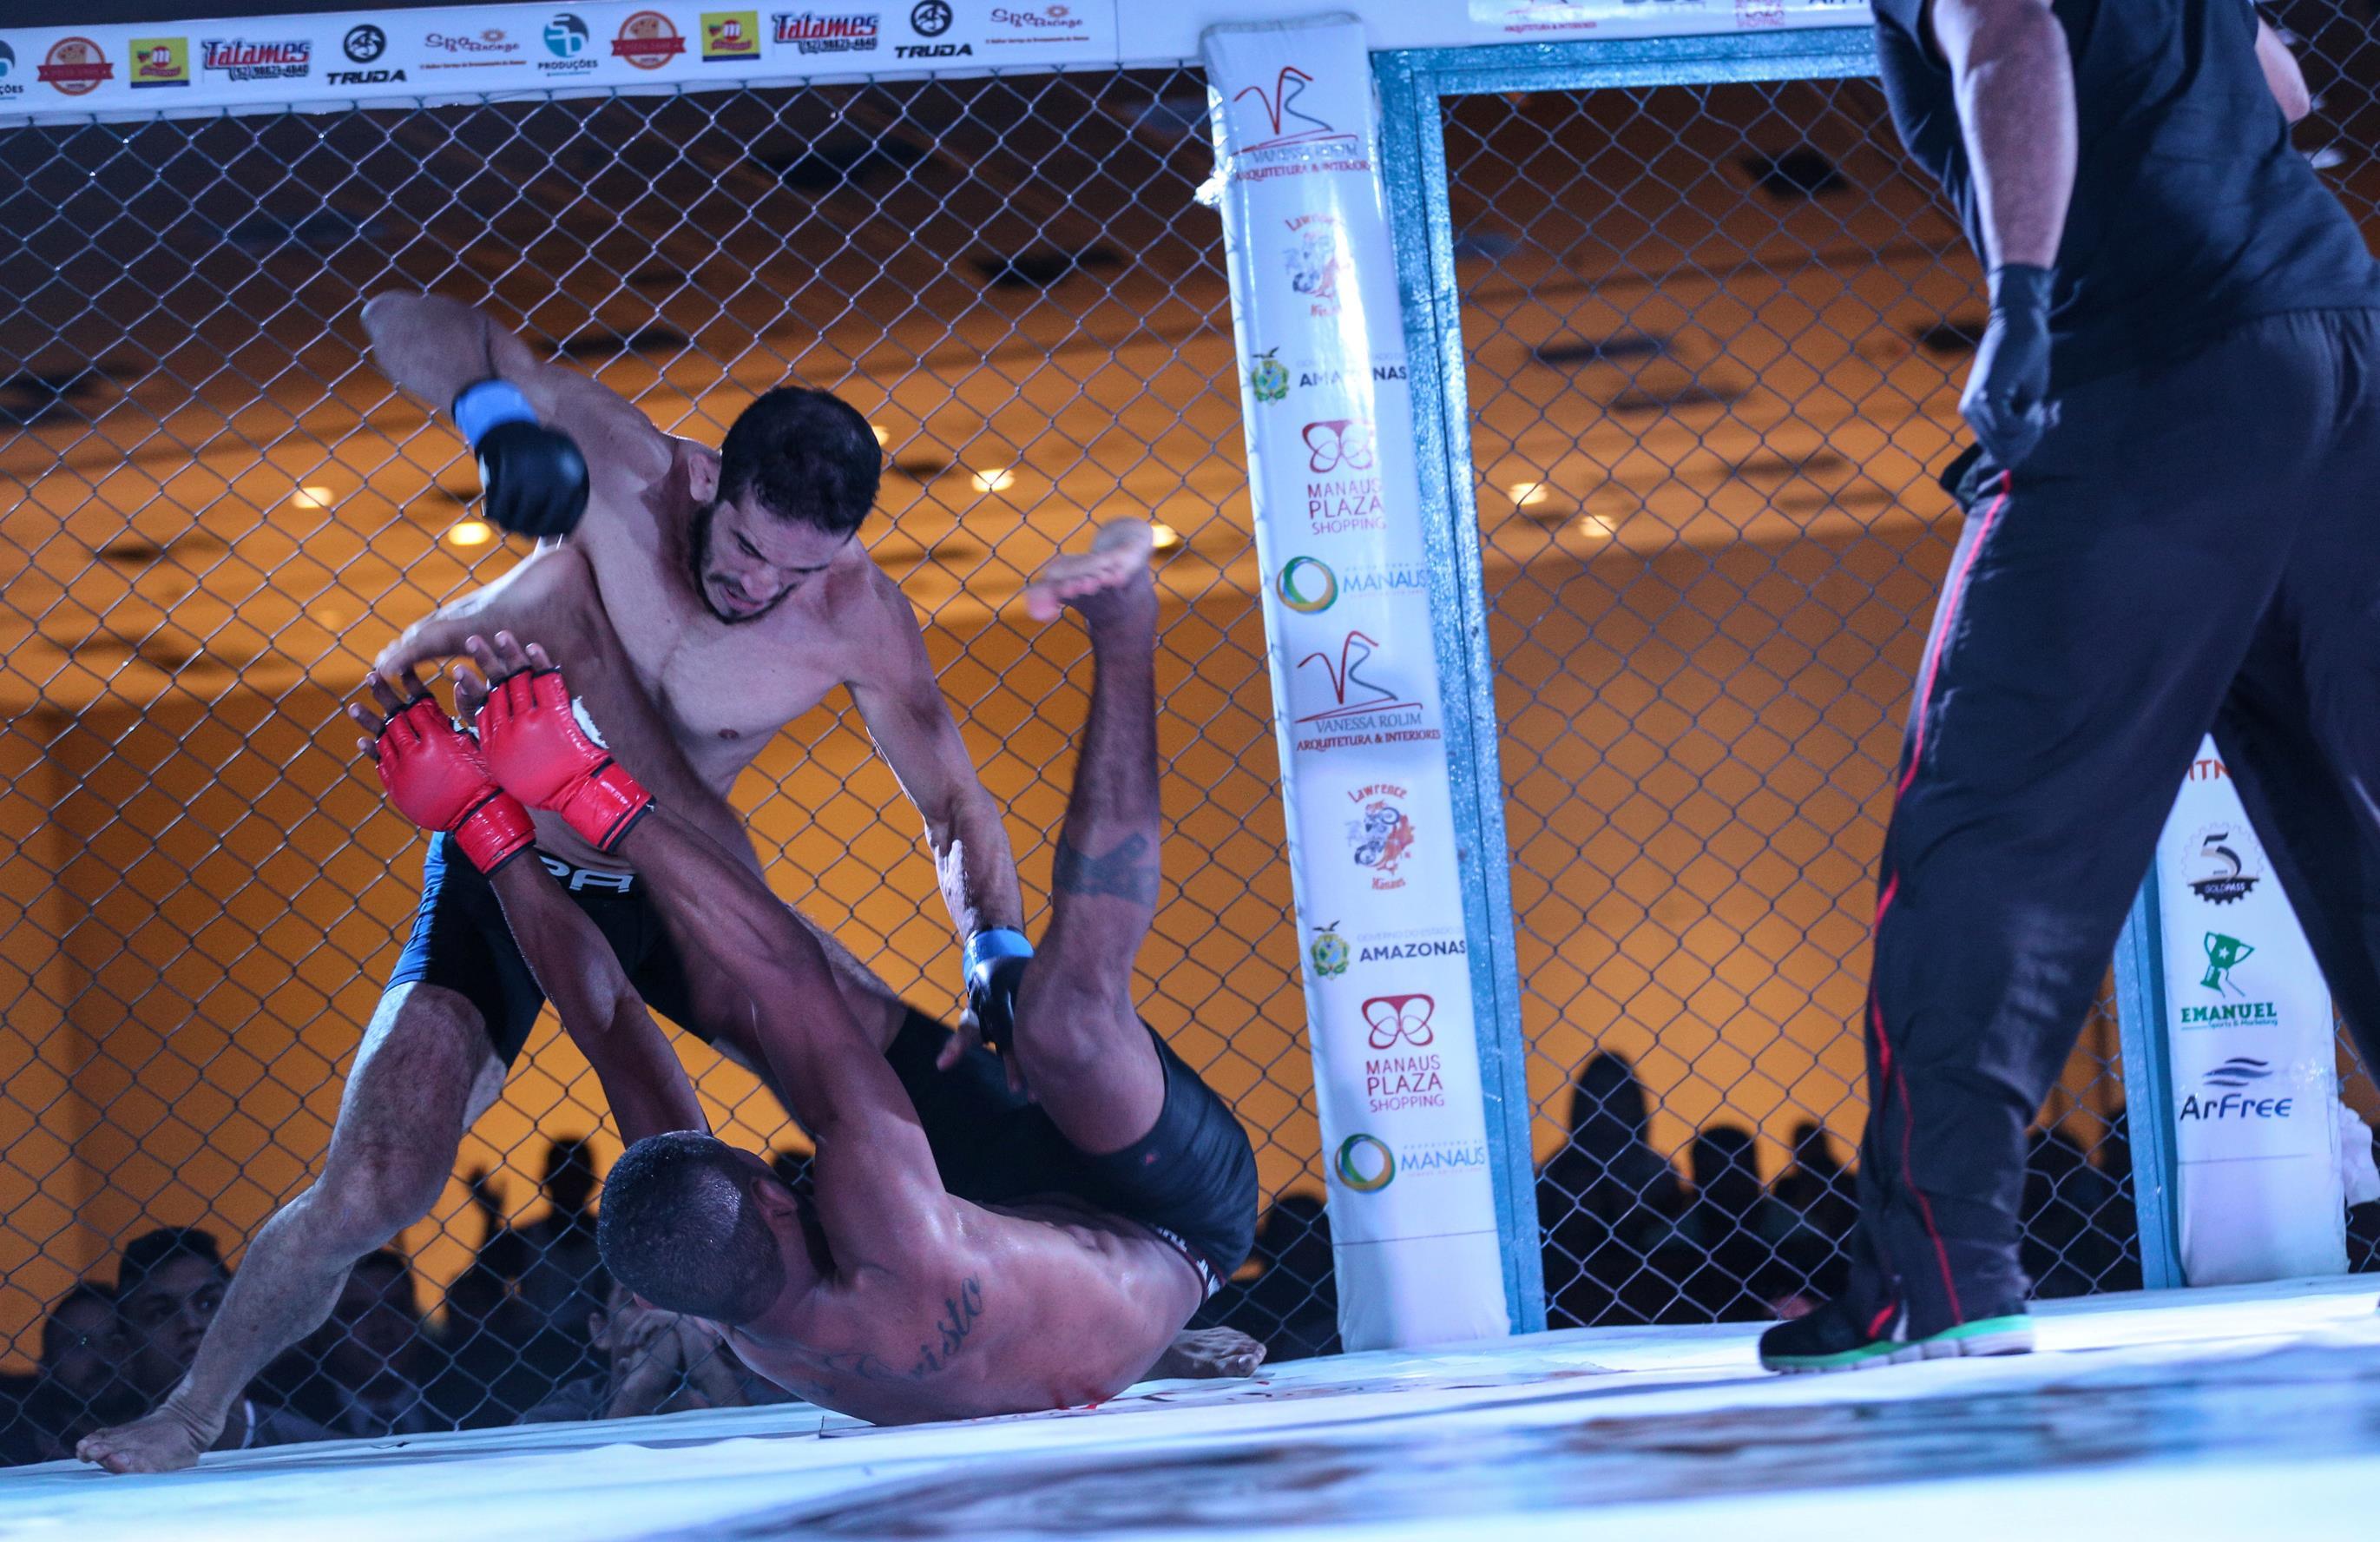 rei-da-selva-8-wagner-noronha-venceu-marcos-marajo-foto-4-by-michael-dantas